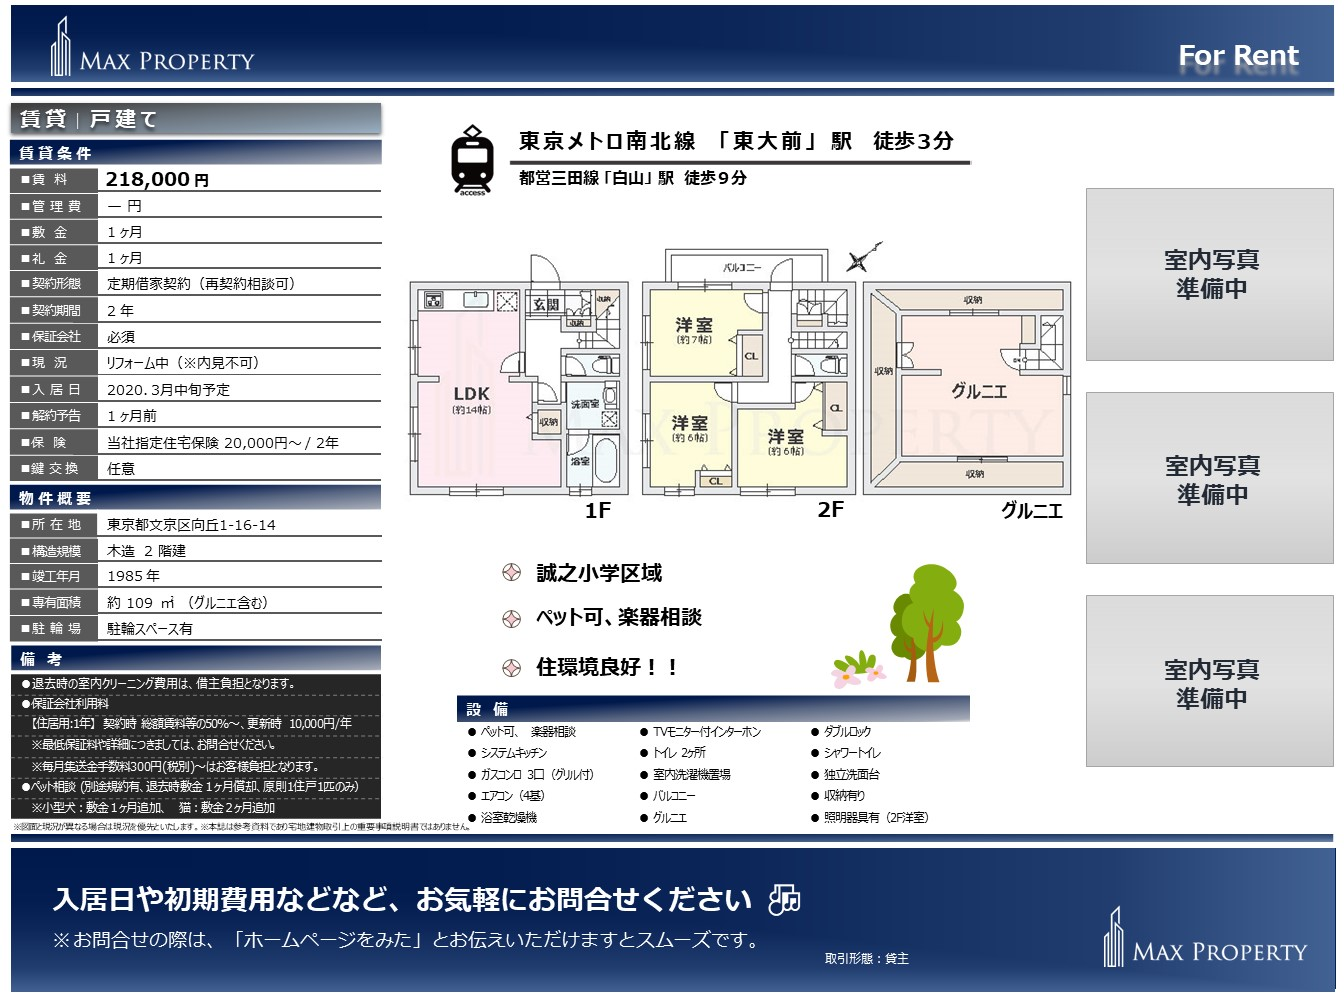 HP_文京区向丘一丁目戸建て_20200206